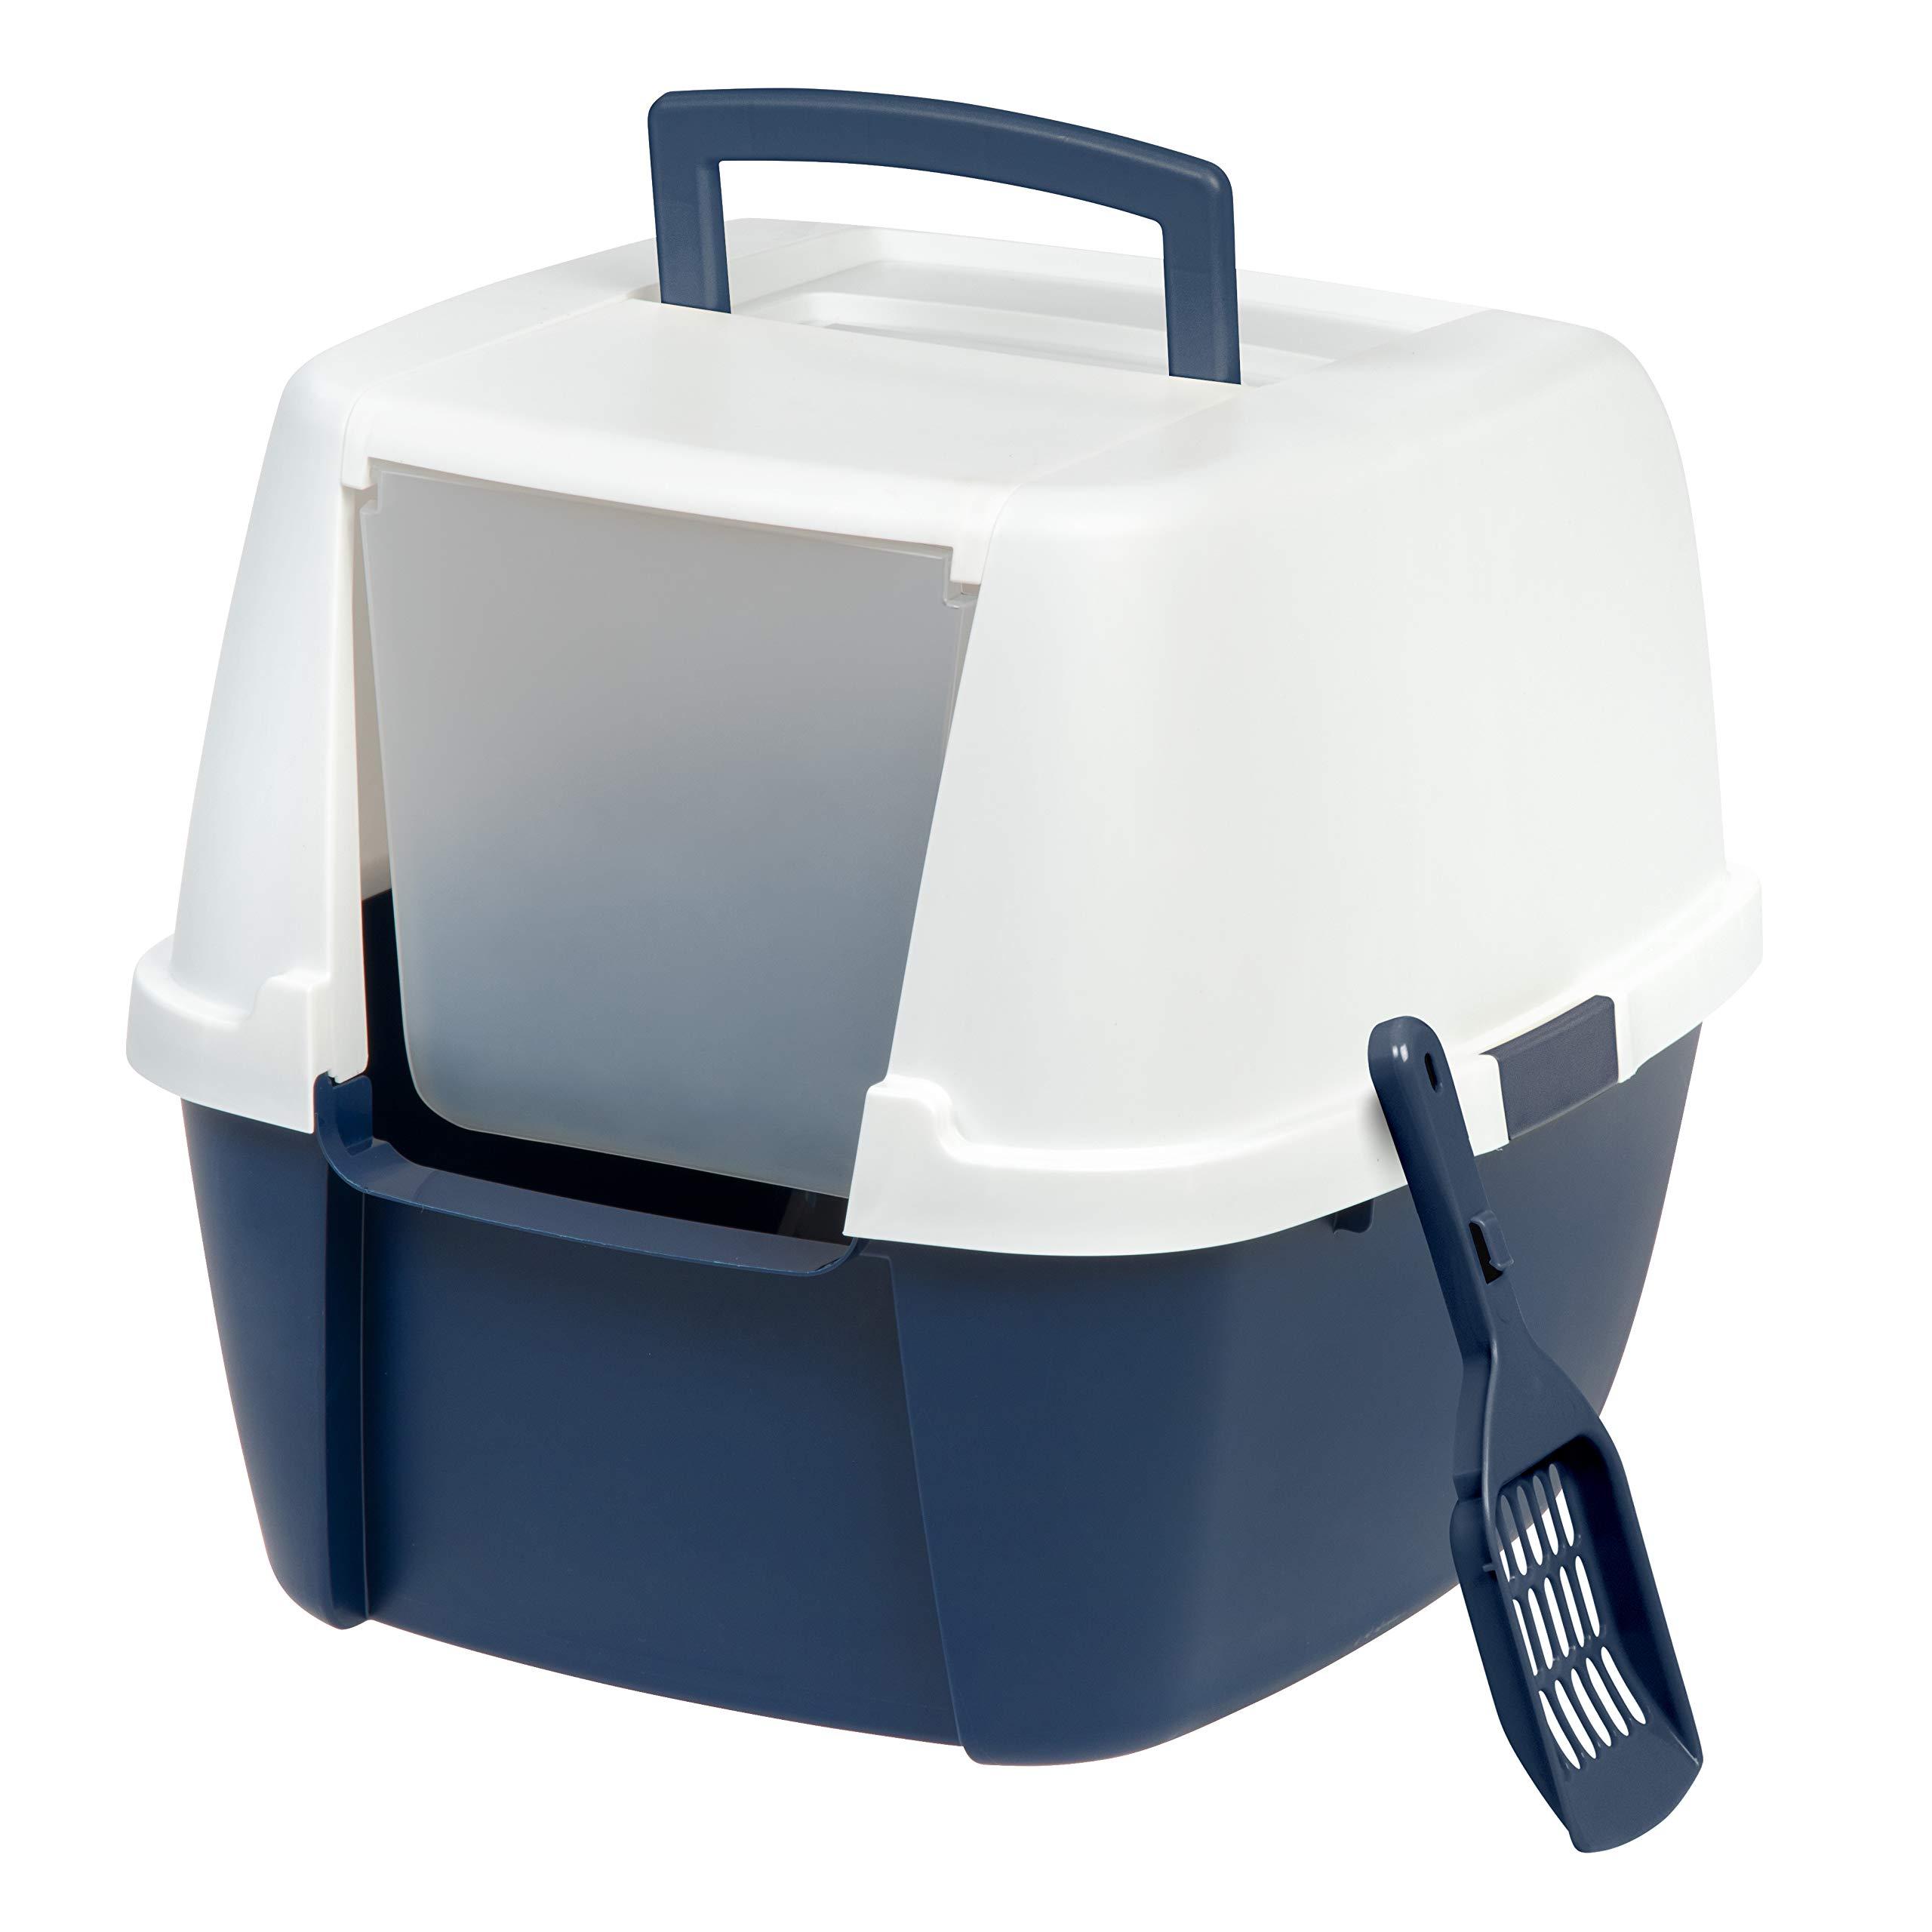 IRIS Jumbo Hooded Litter Box with Scoop, Navy by IRIS USA, Inc.